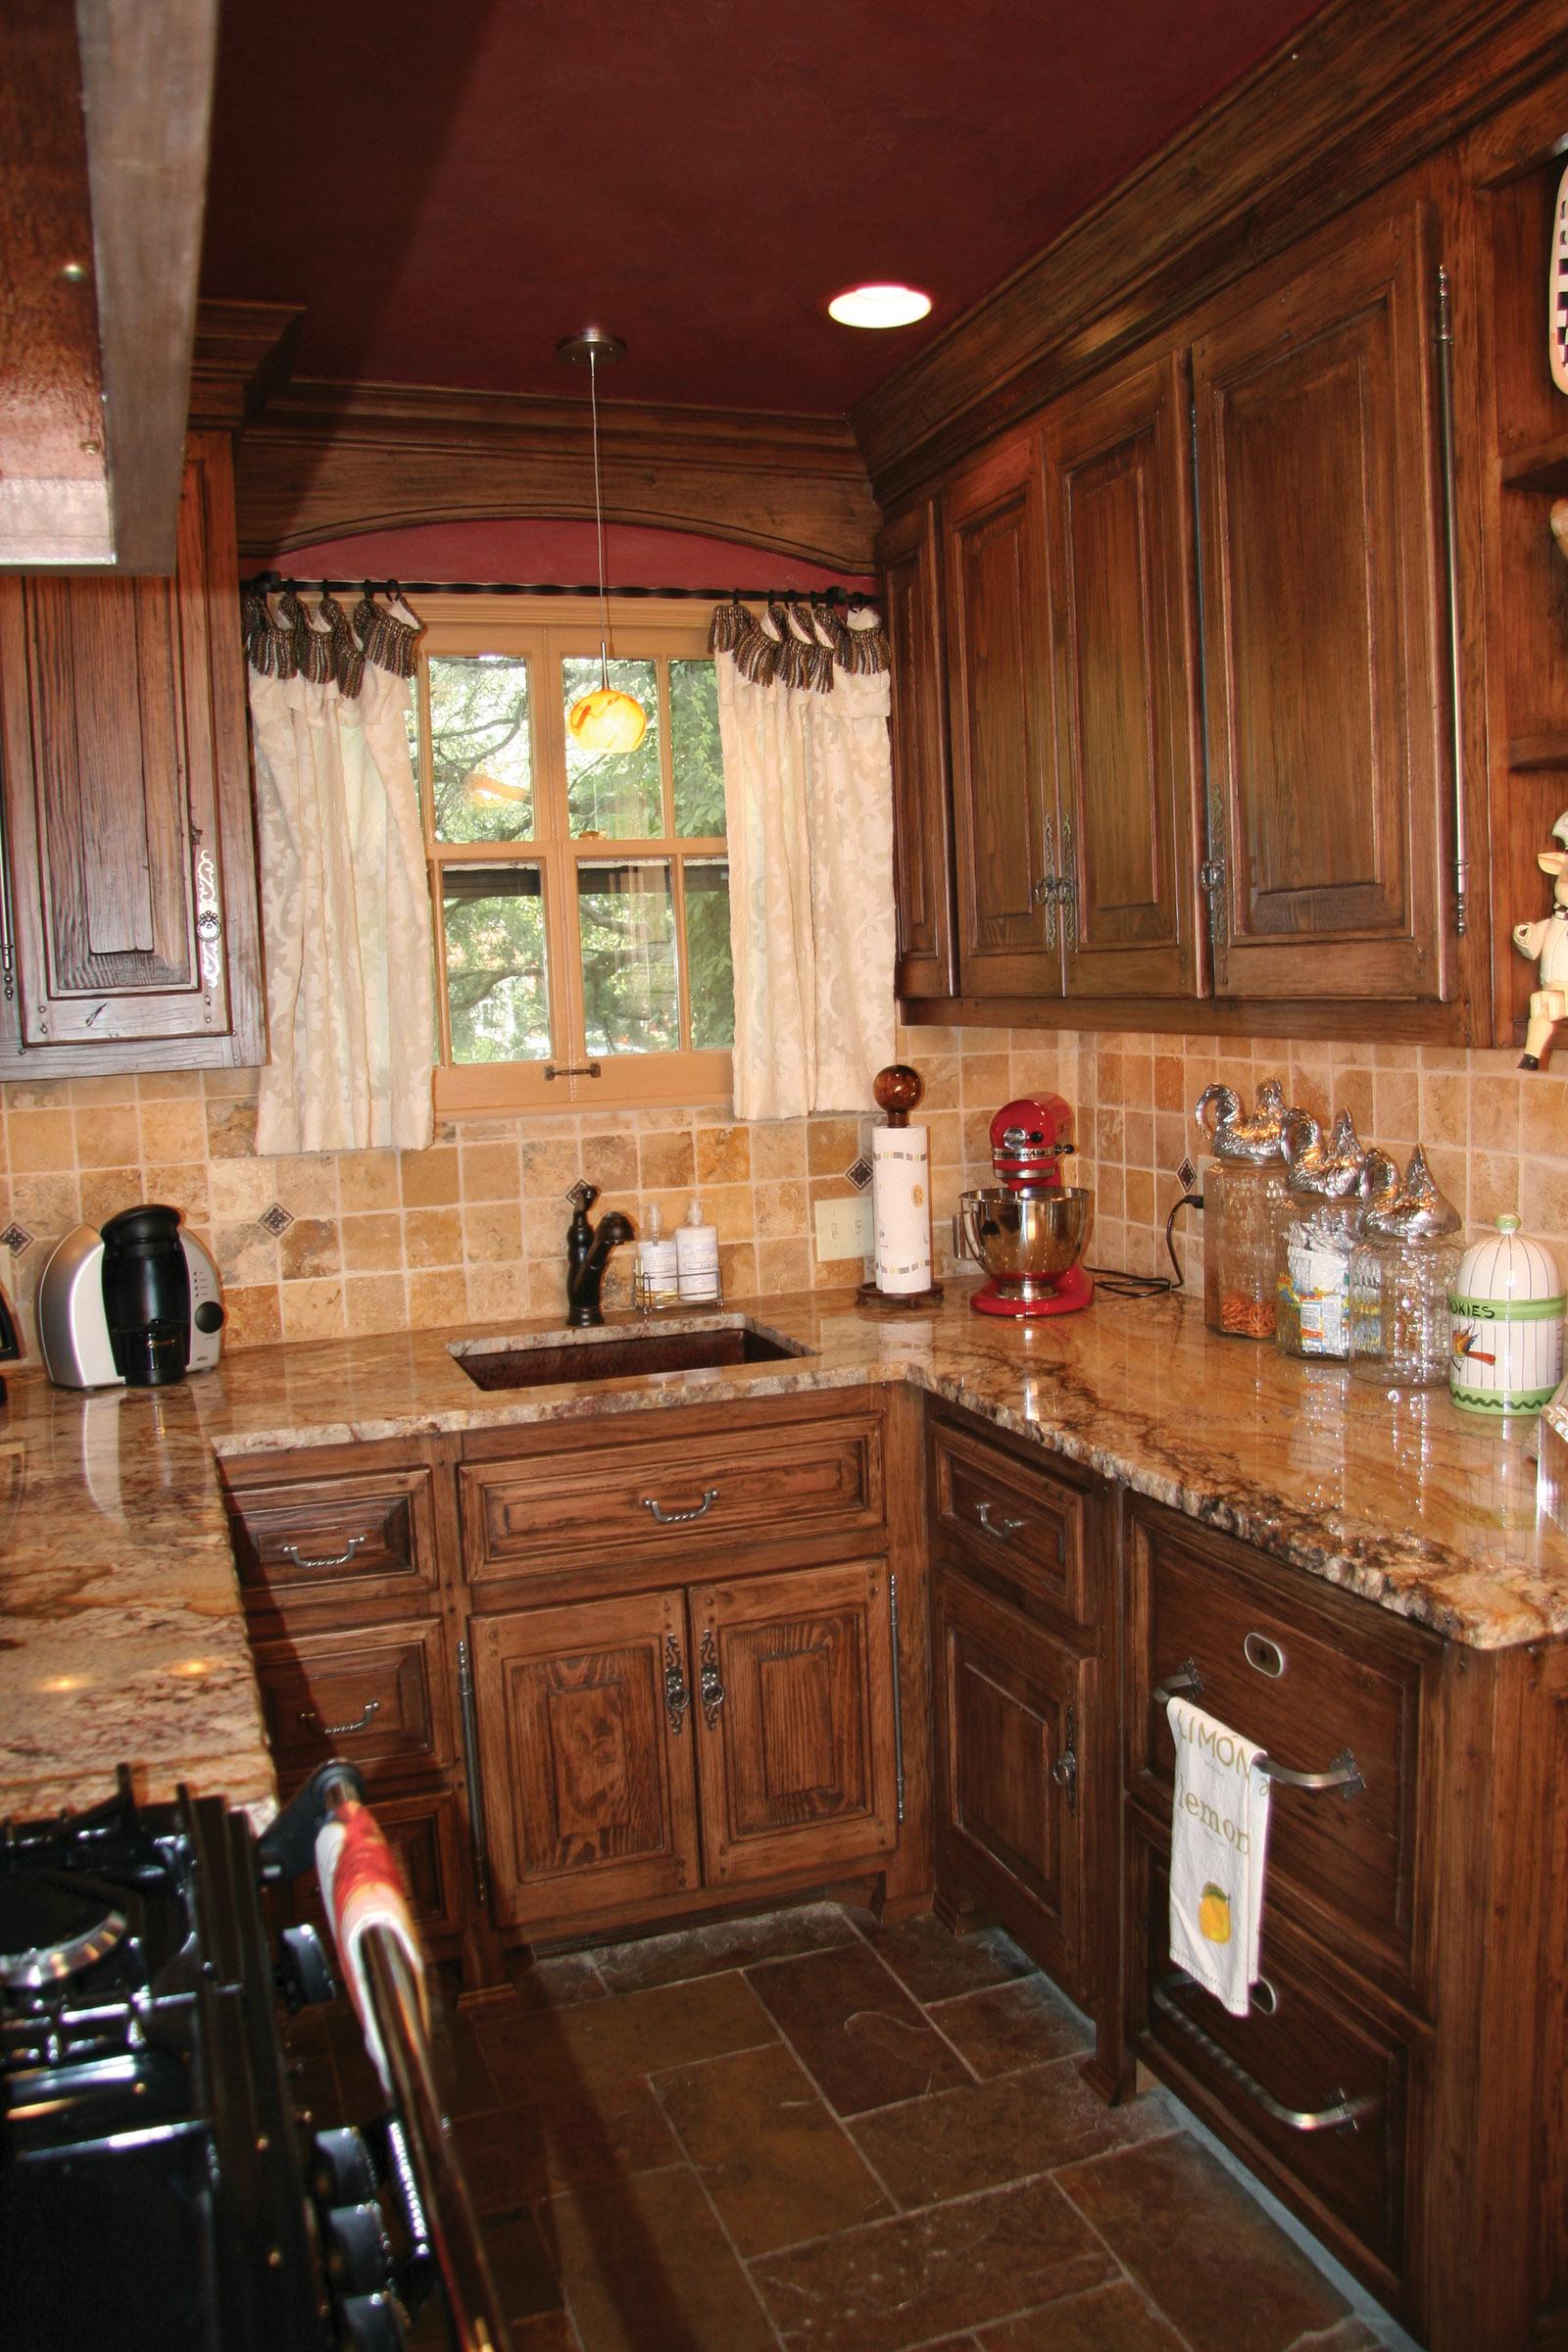 Old World Rustic Kitchen.jpg